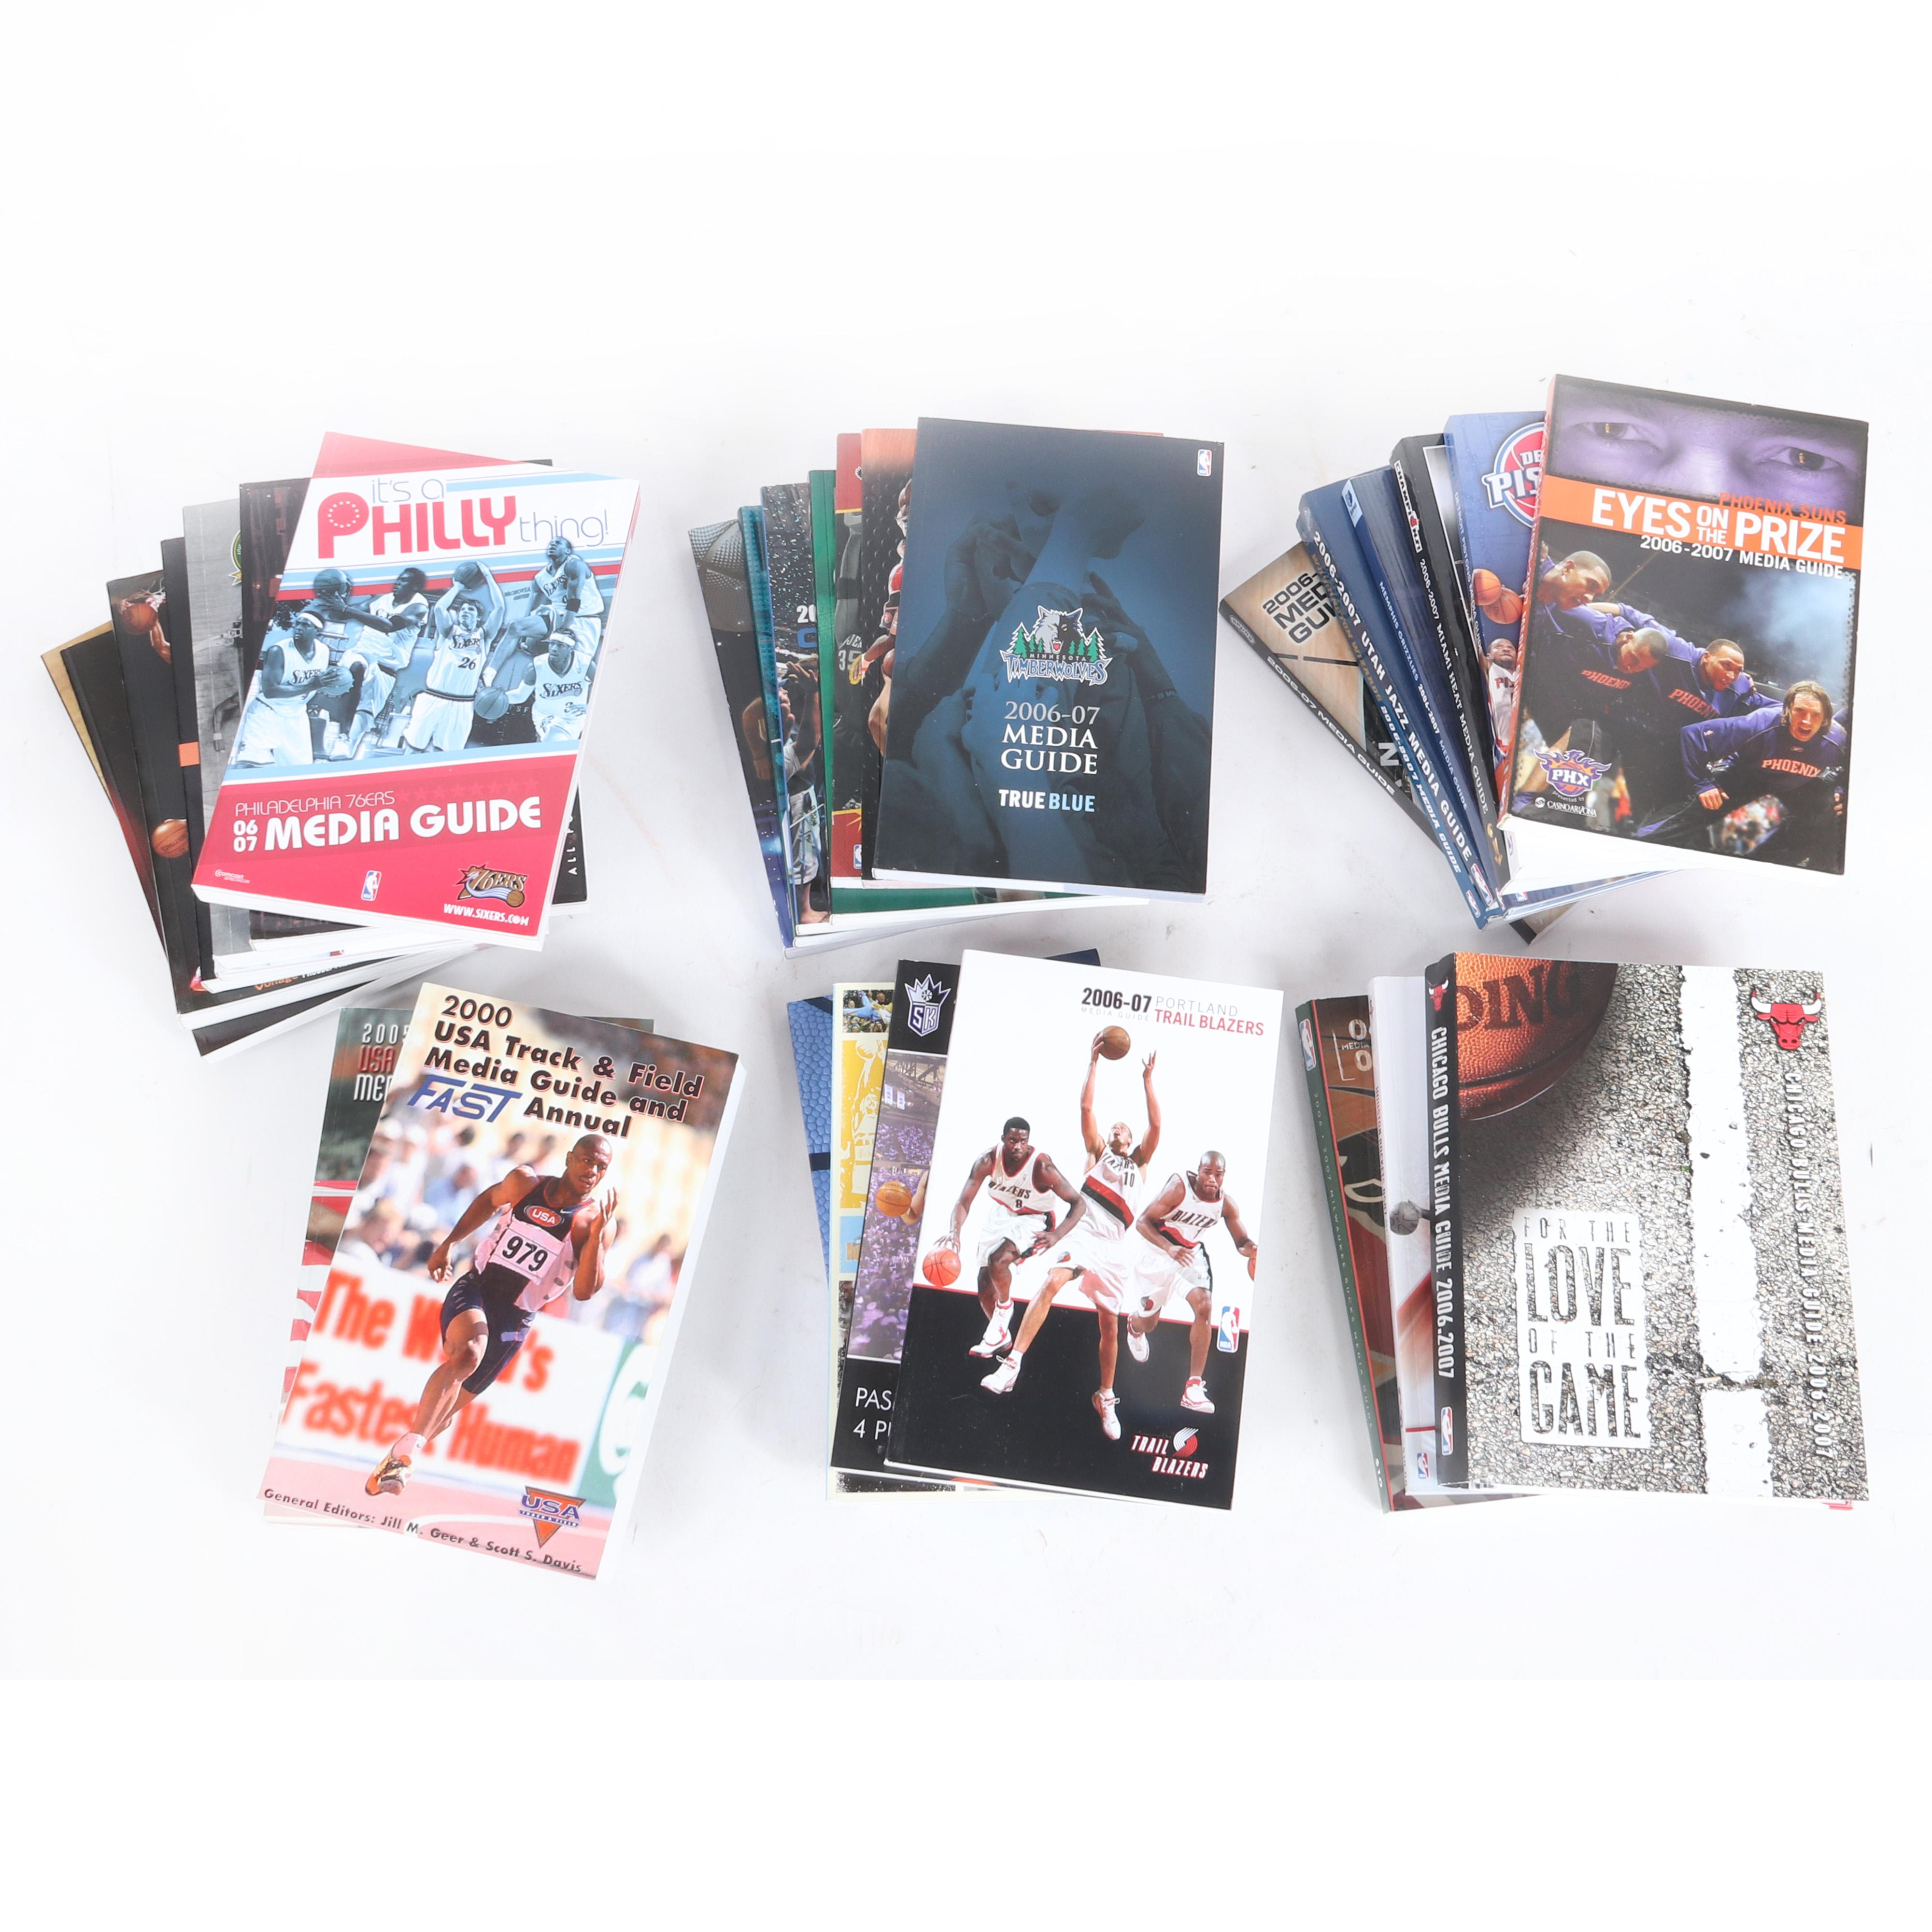 29 - 2006-07 NBA Team Media Guides & 2 USA Track & Field Media Guides